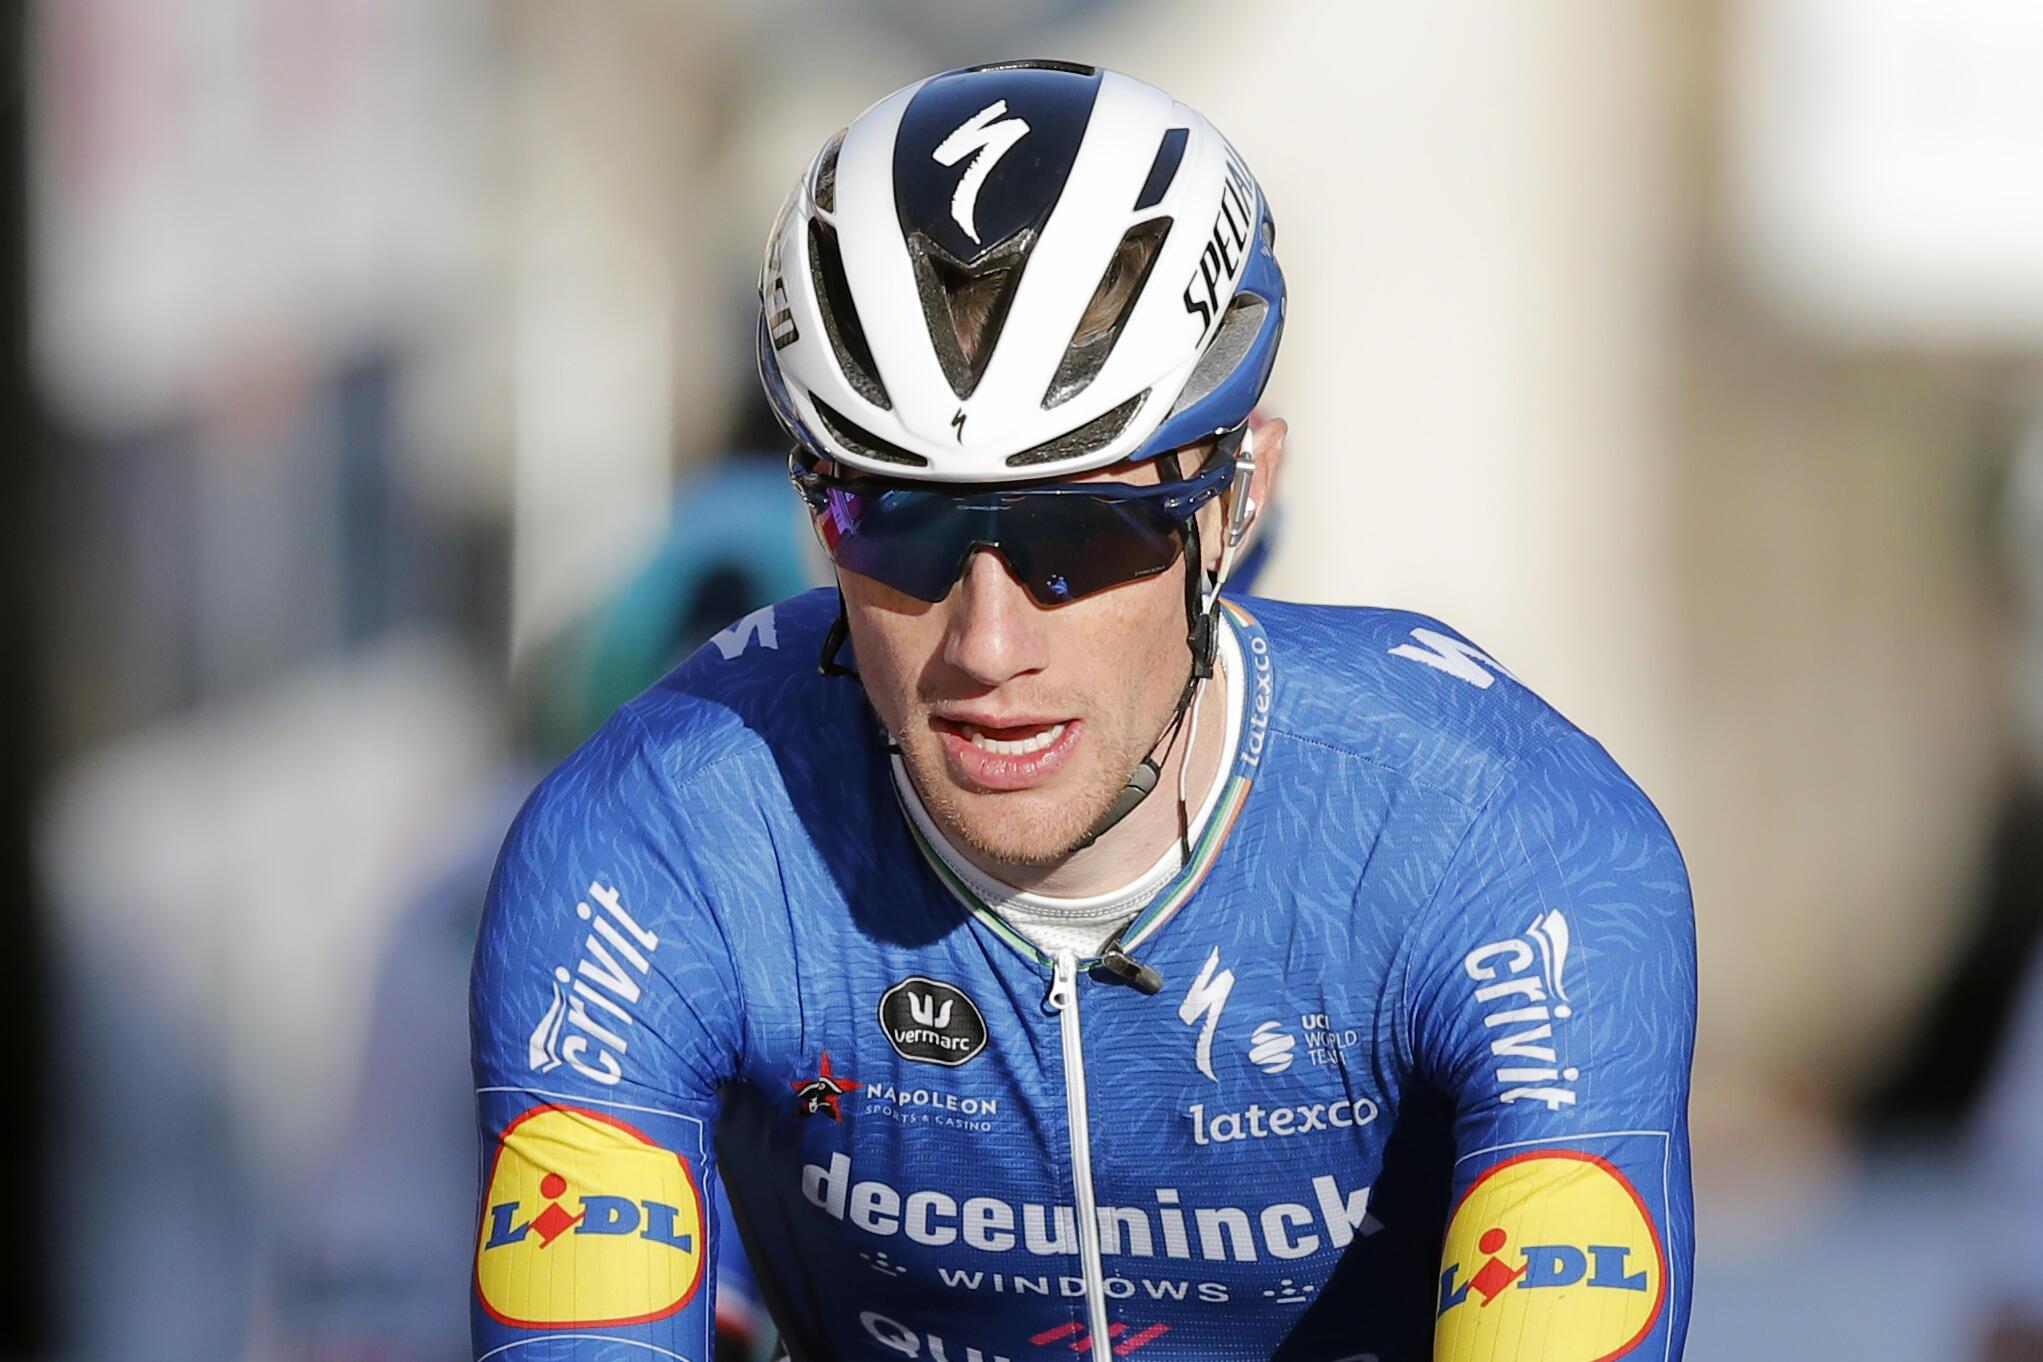 PHOTO Cyclisme Sam Bennett - 7 mars 2021